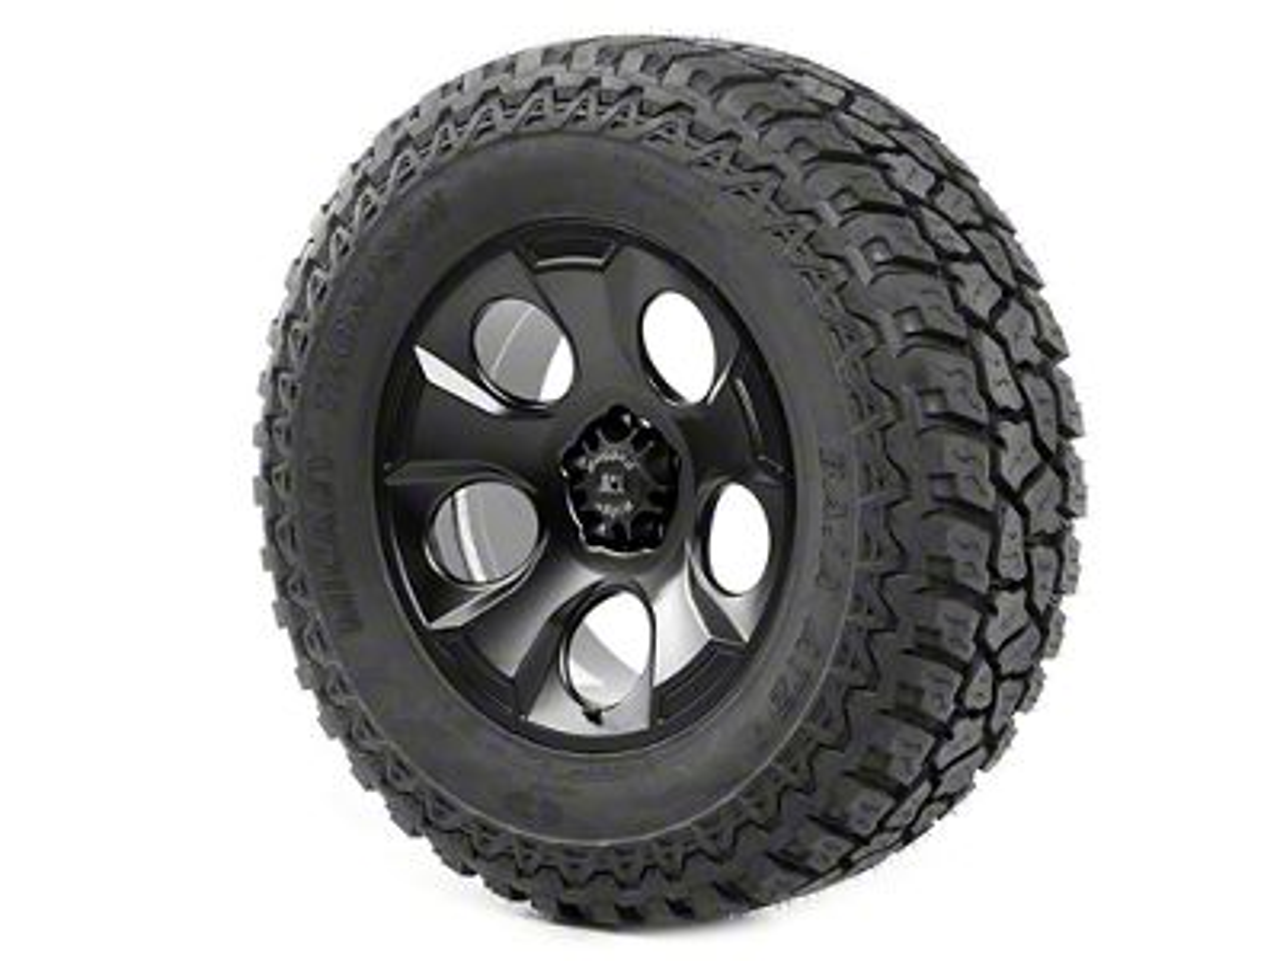 Rugged Ridge Drakon Wheel 20x9 Black Satin and Mickey Thompson ATZ P3 37x12.50x20 Tire (07-18 Jeep Wrangler JK)